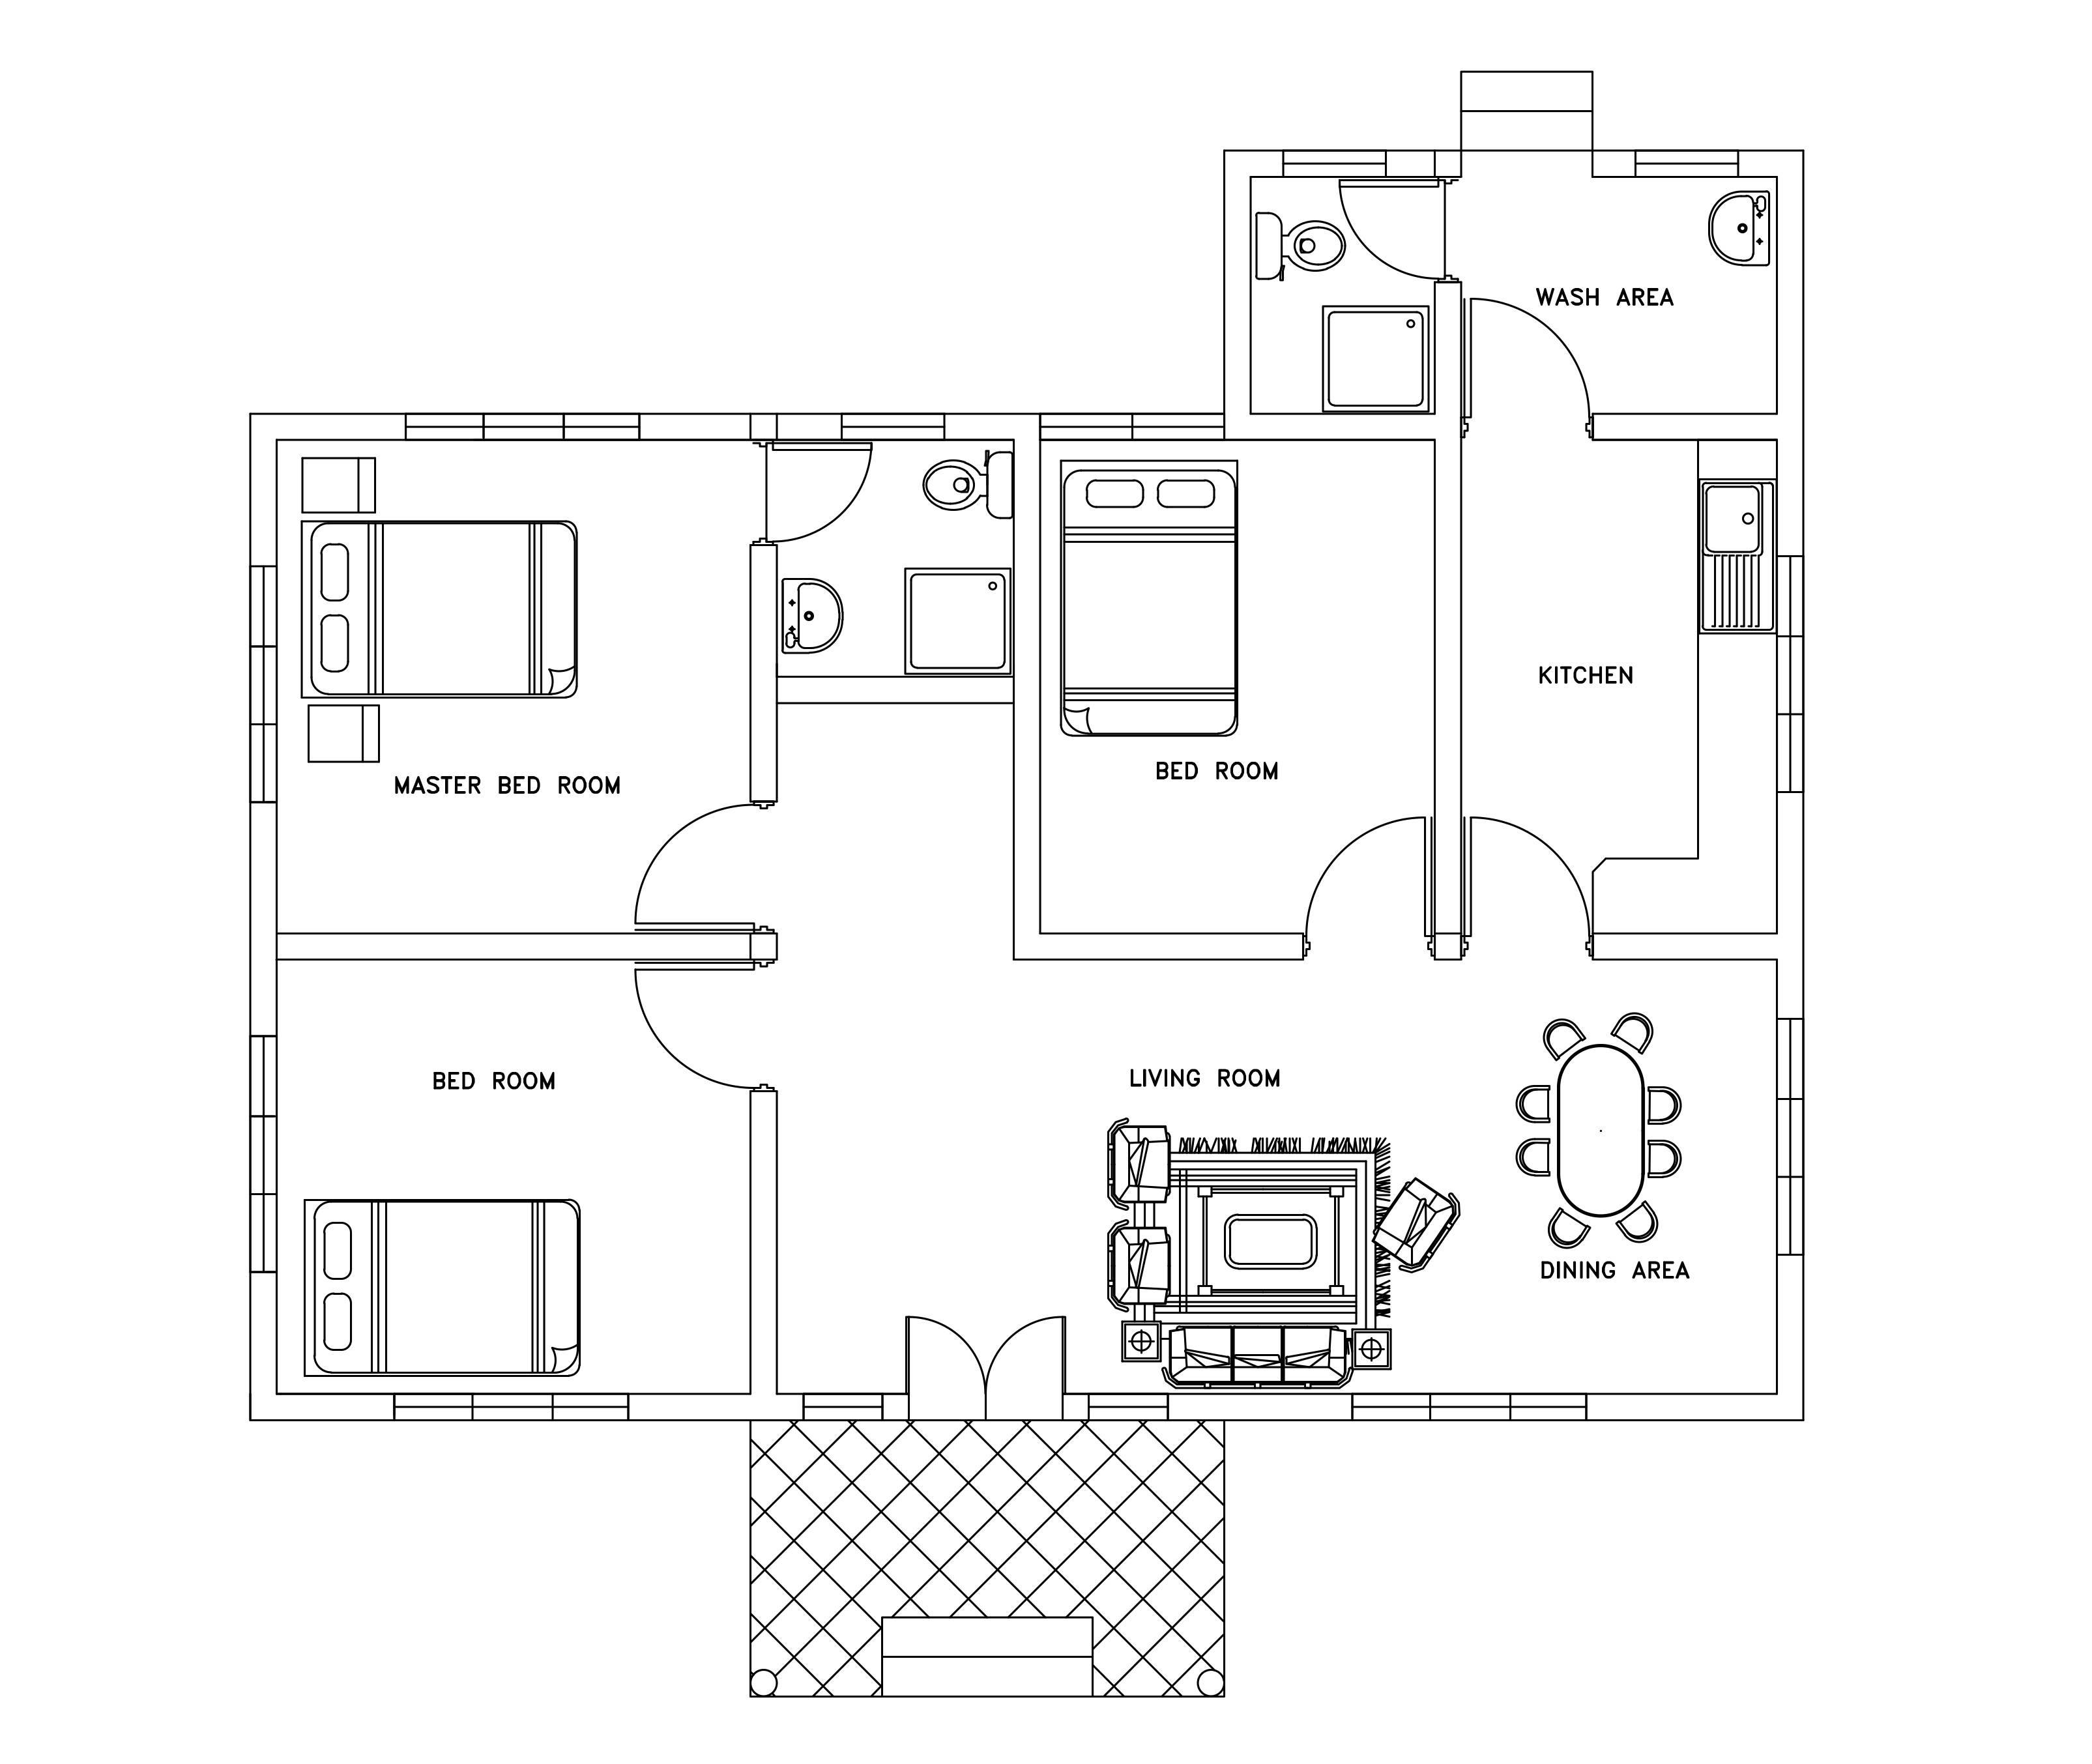 Autocad House Plans Dwg Escortsea House Plans 176286